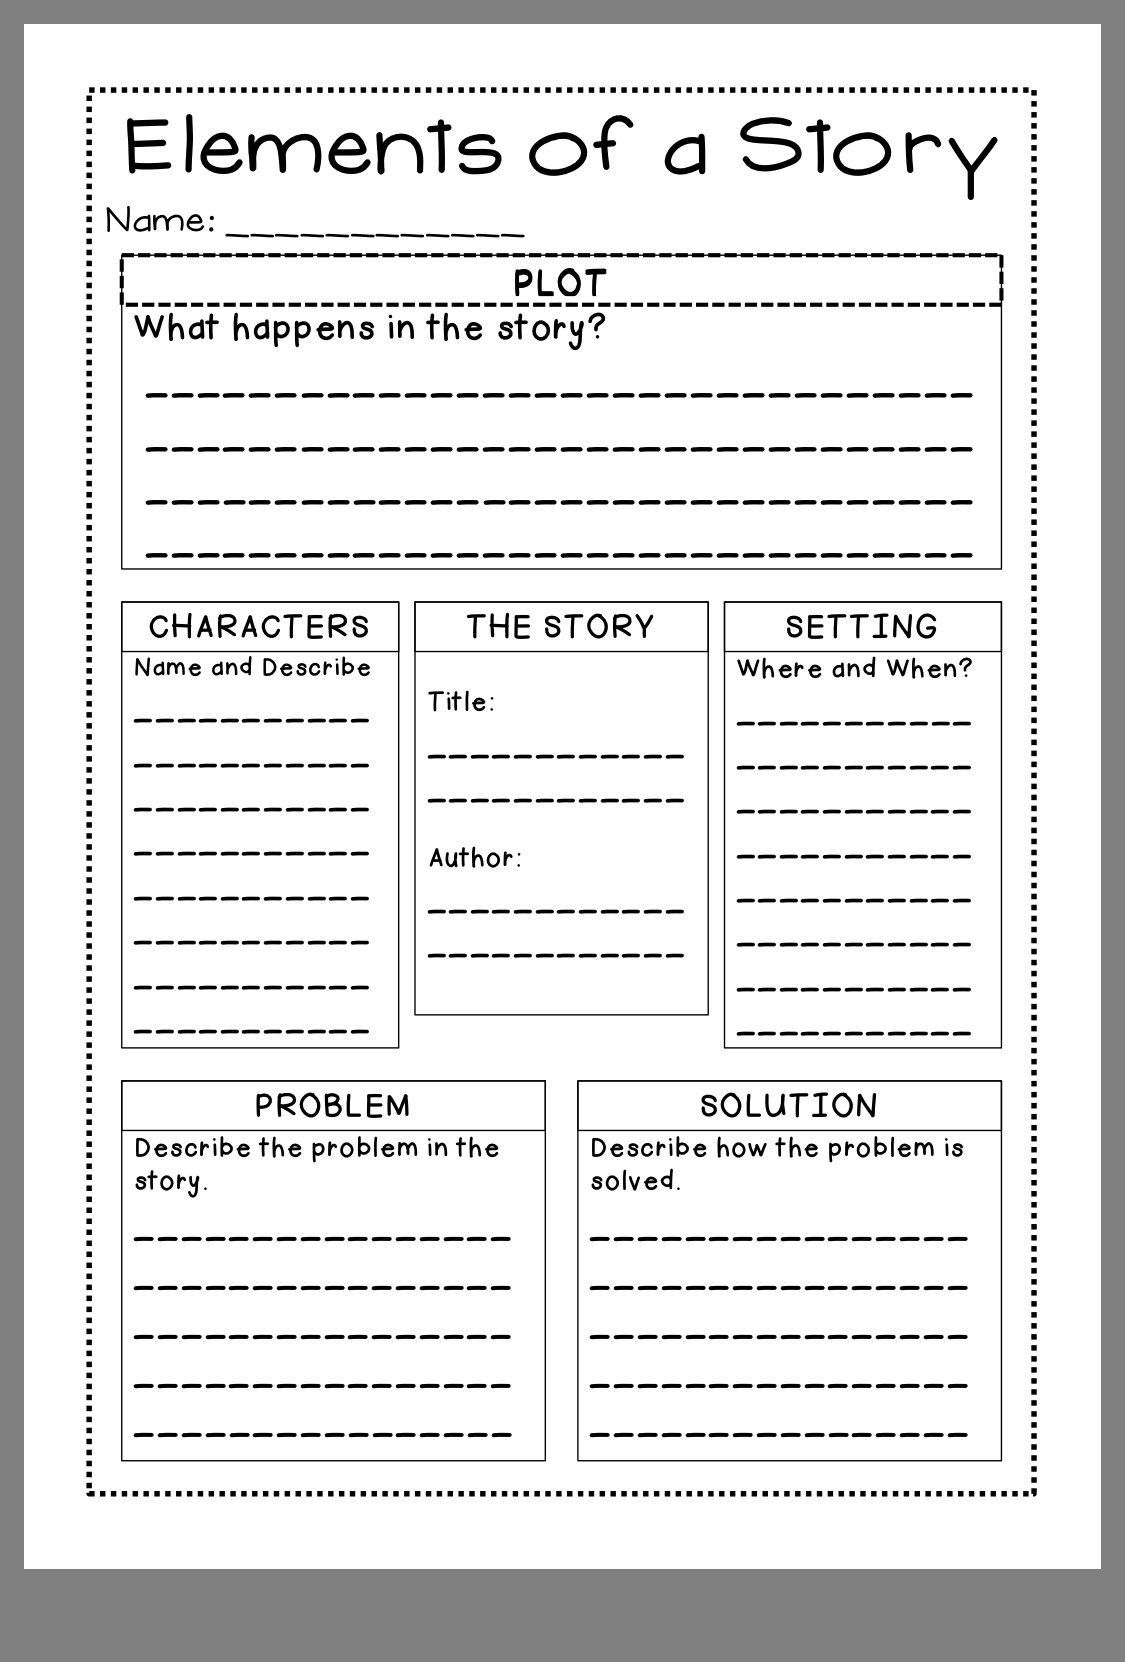 Story Elements Worksheet 4th Grade Pin By Jill Brewington